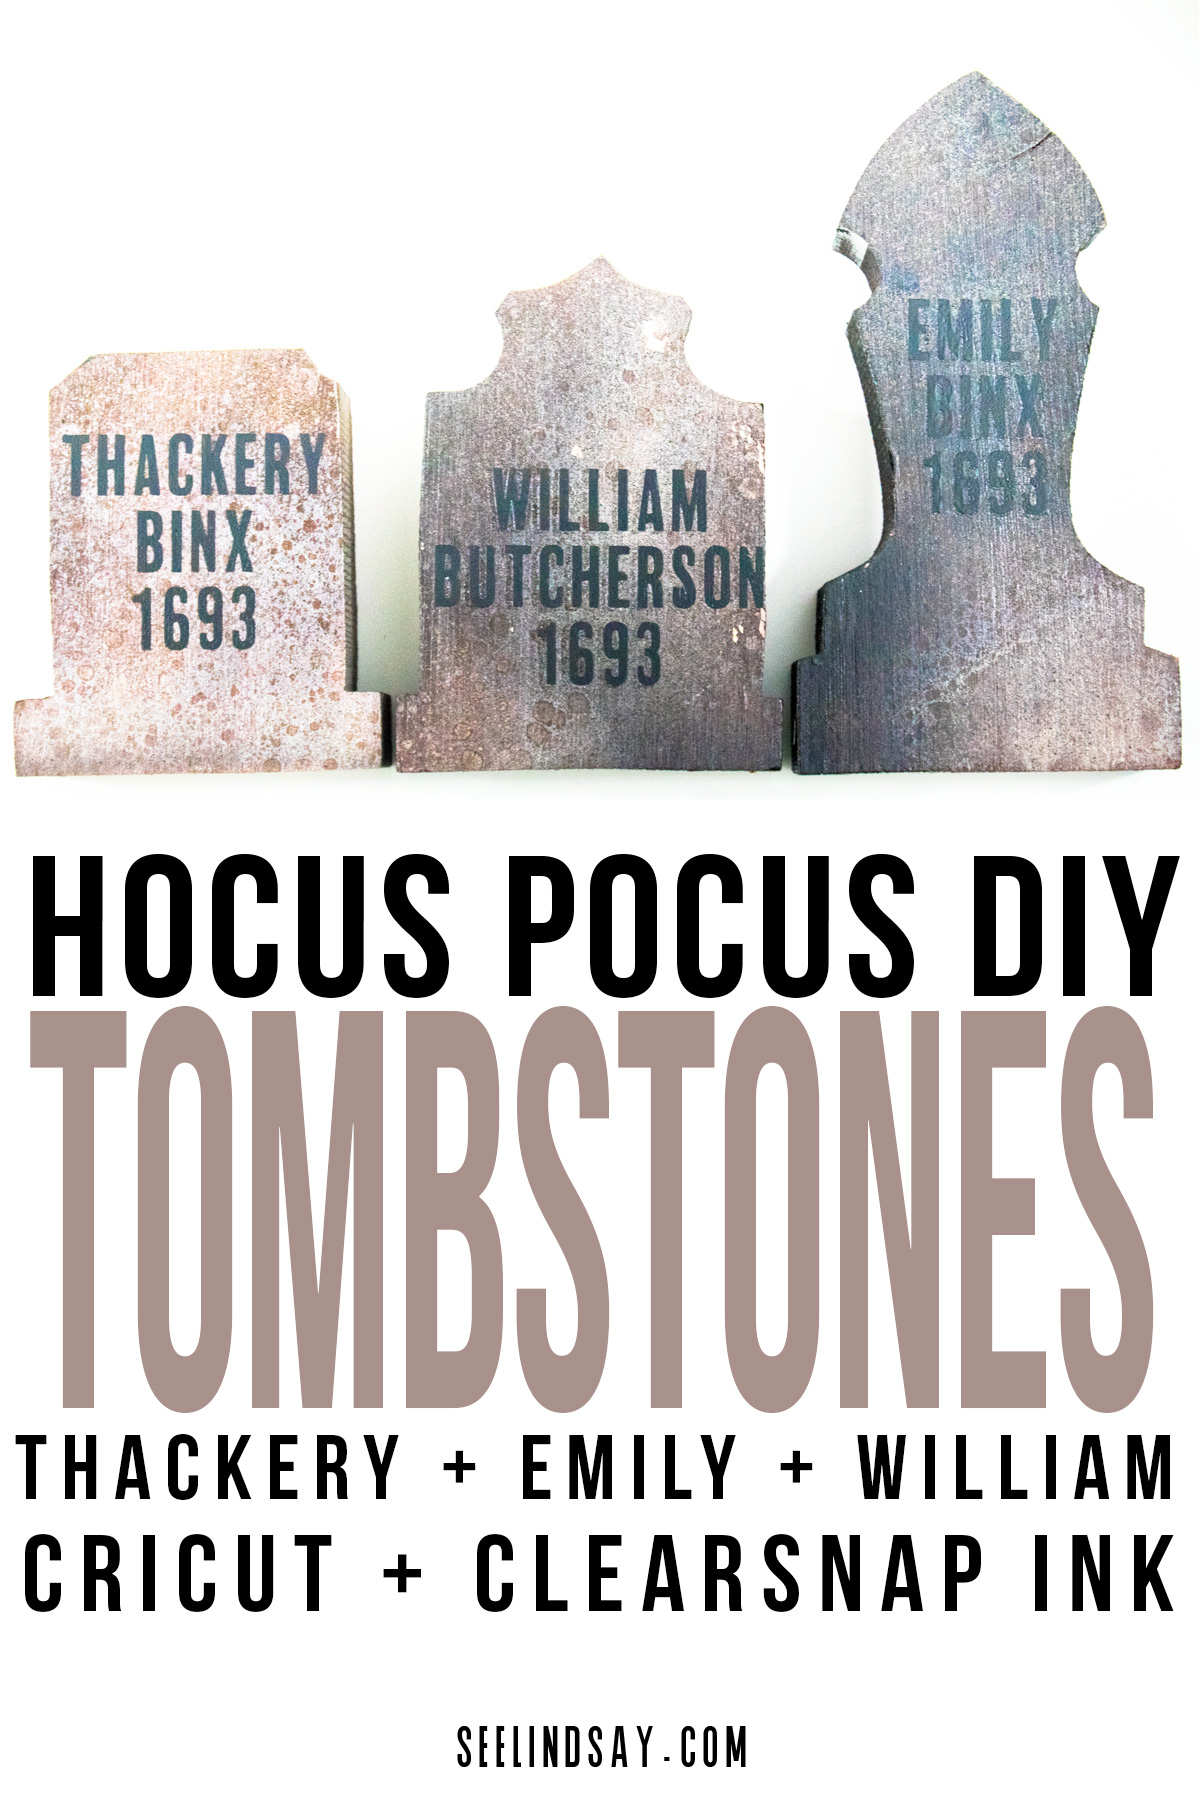 hocus pocus tombstones